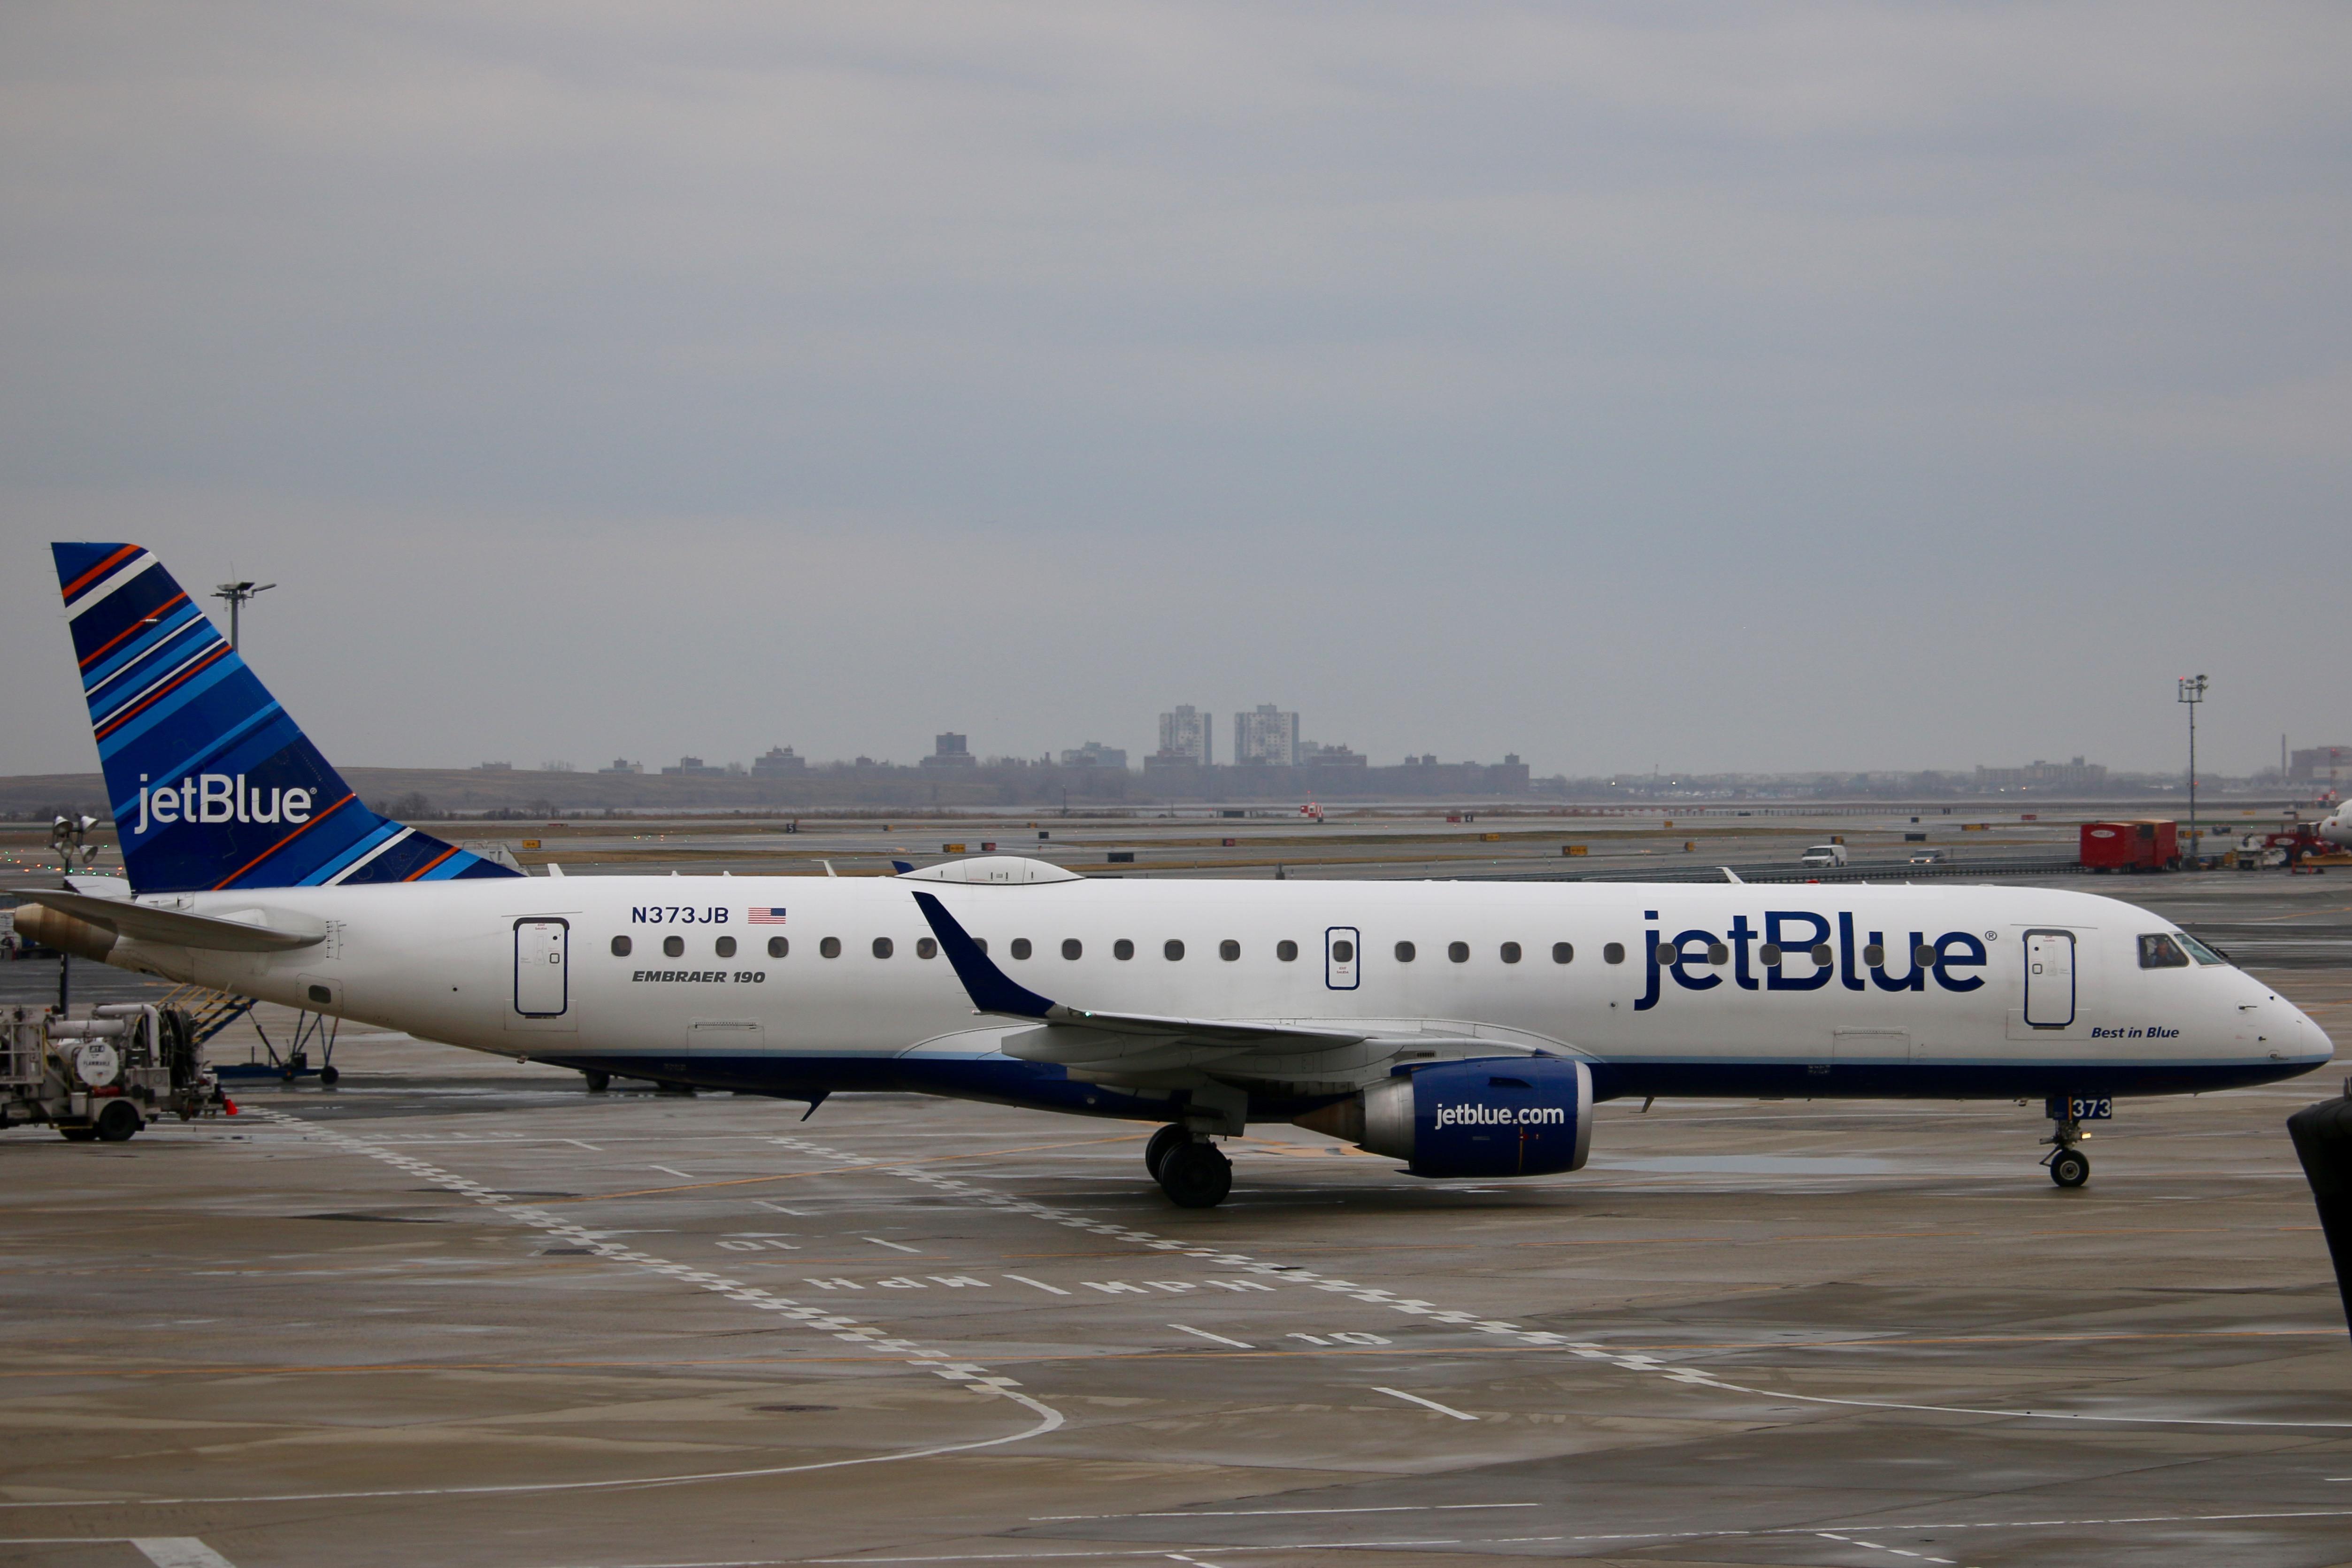 jetblue airways starting from scratch summary